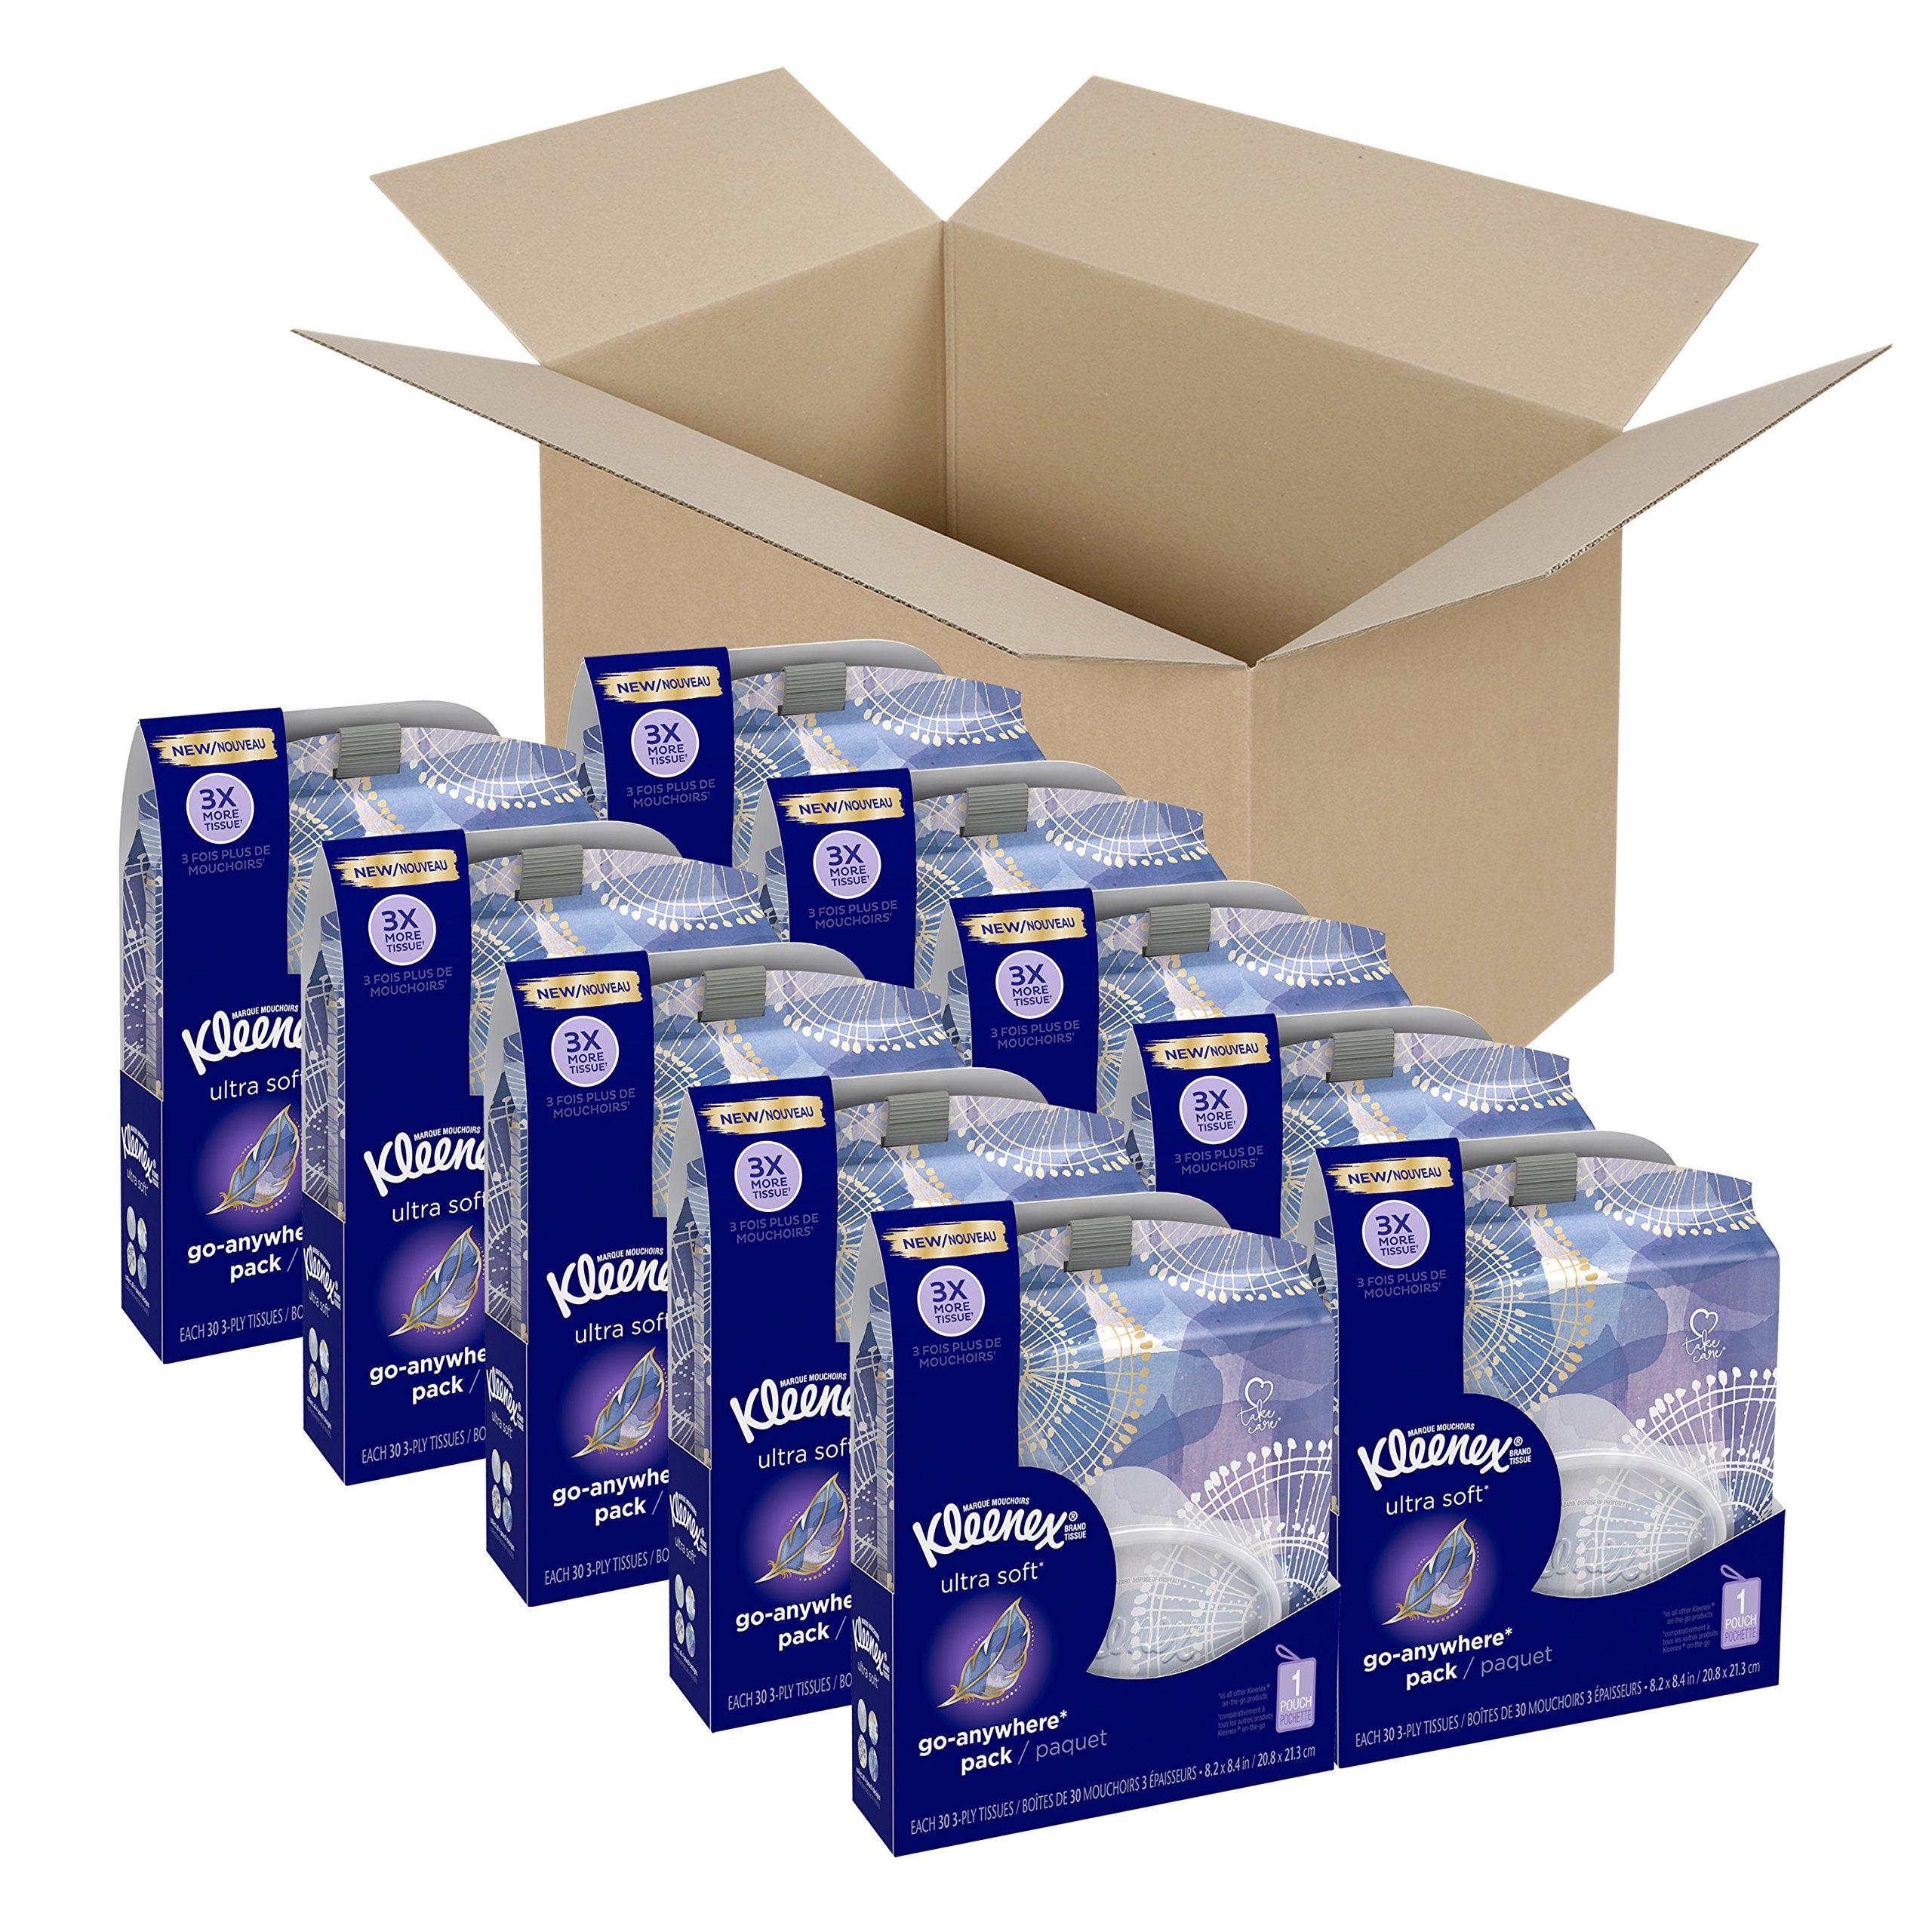 Kleenex Ultra Soft Go Anywhere Clip-On Facial Tissues, 30 Tissues per Travel Pack, 10 Packs by Kleenex